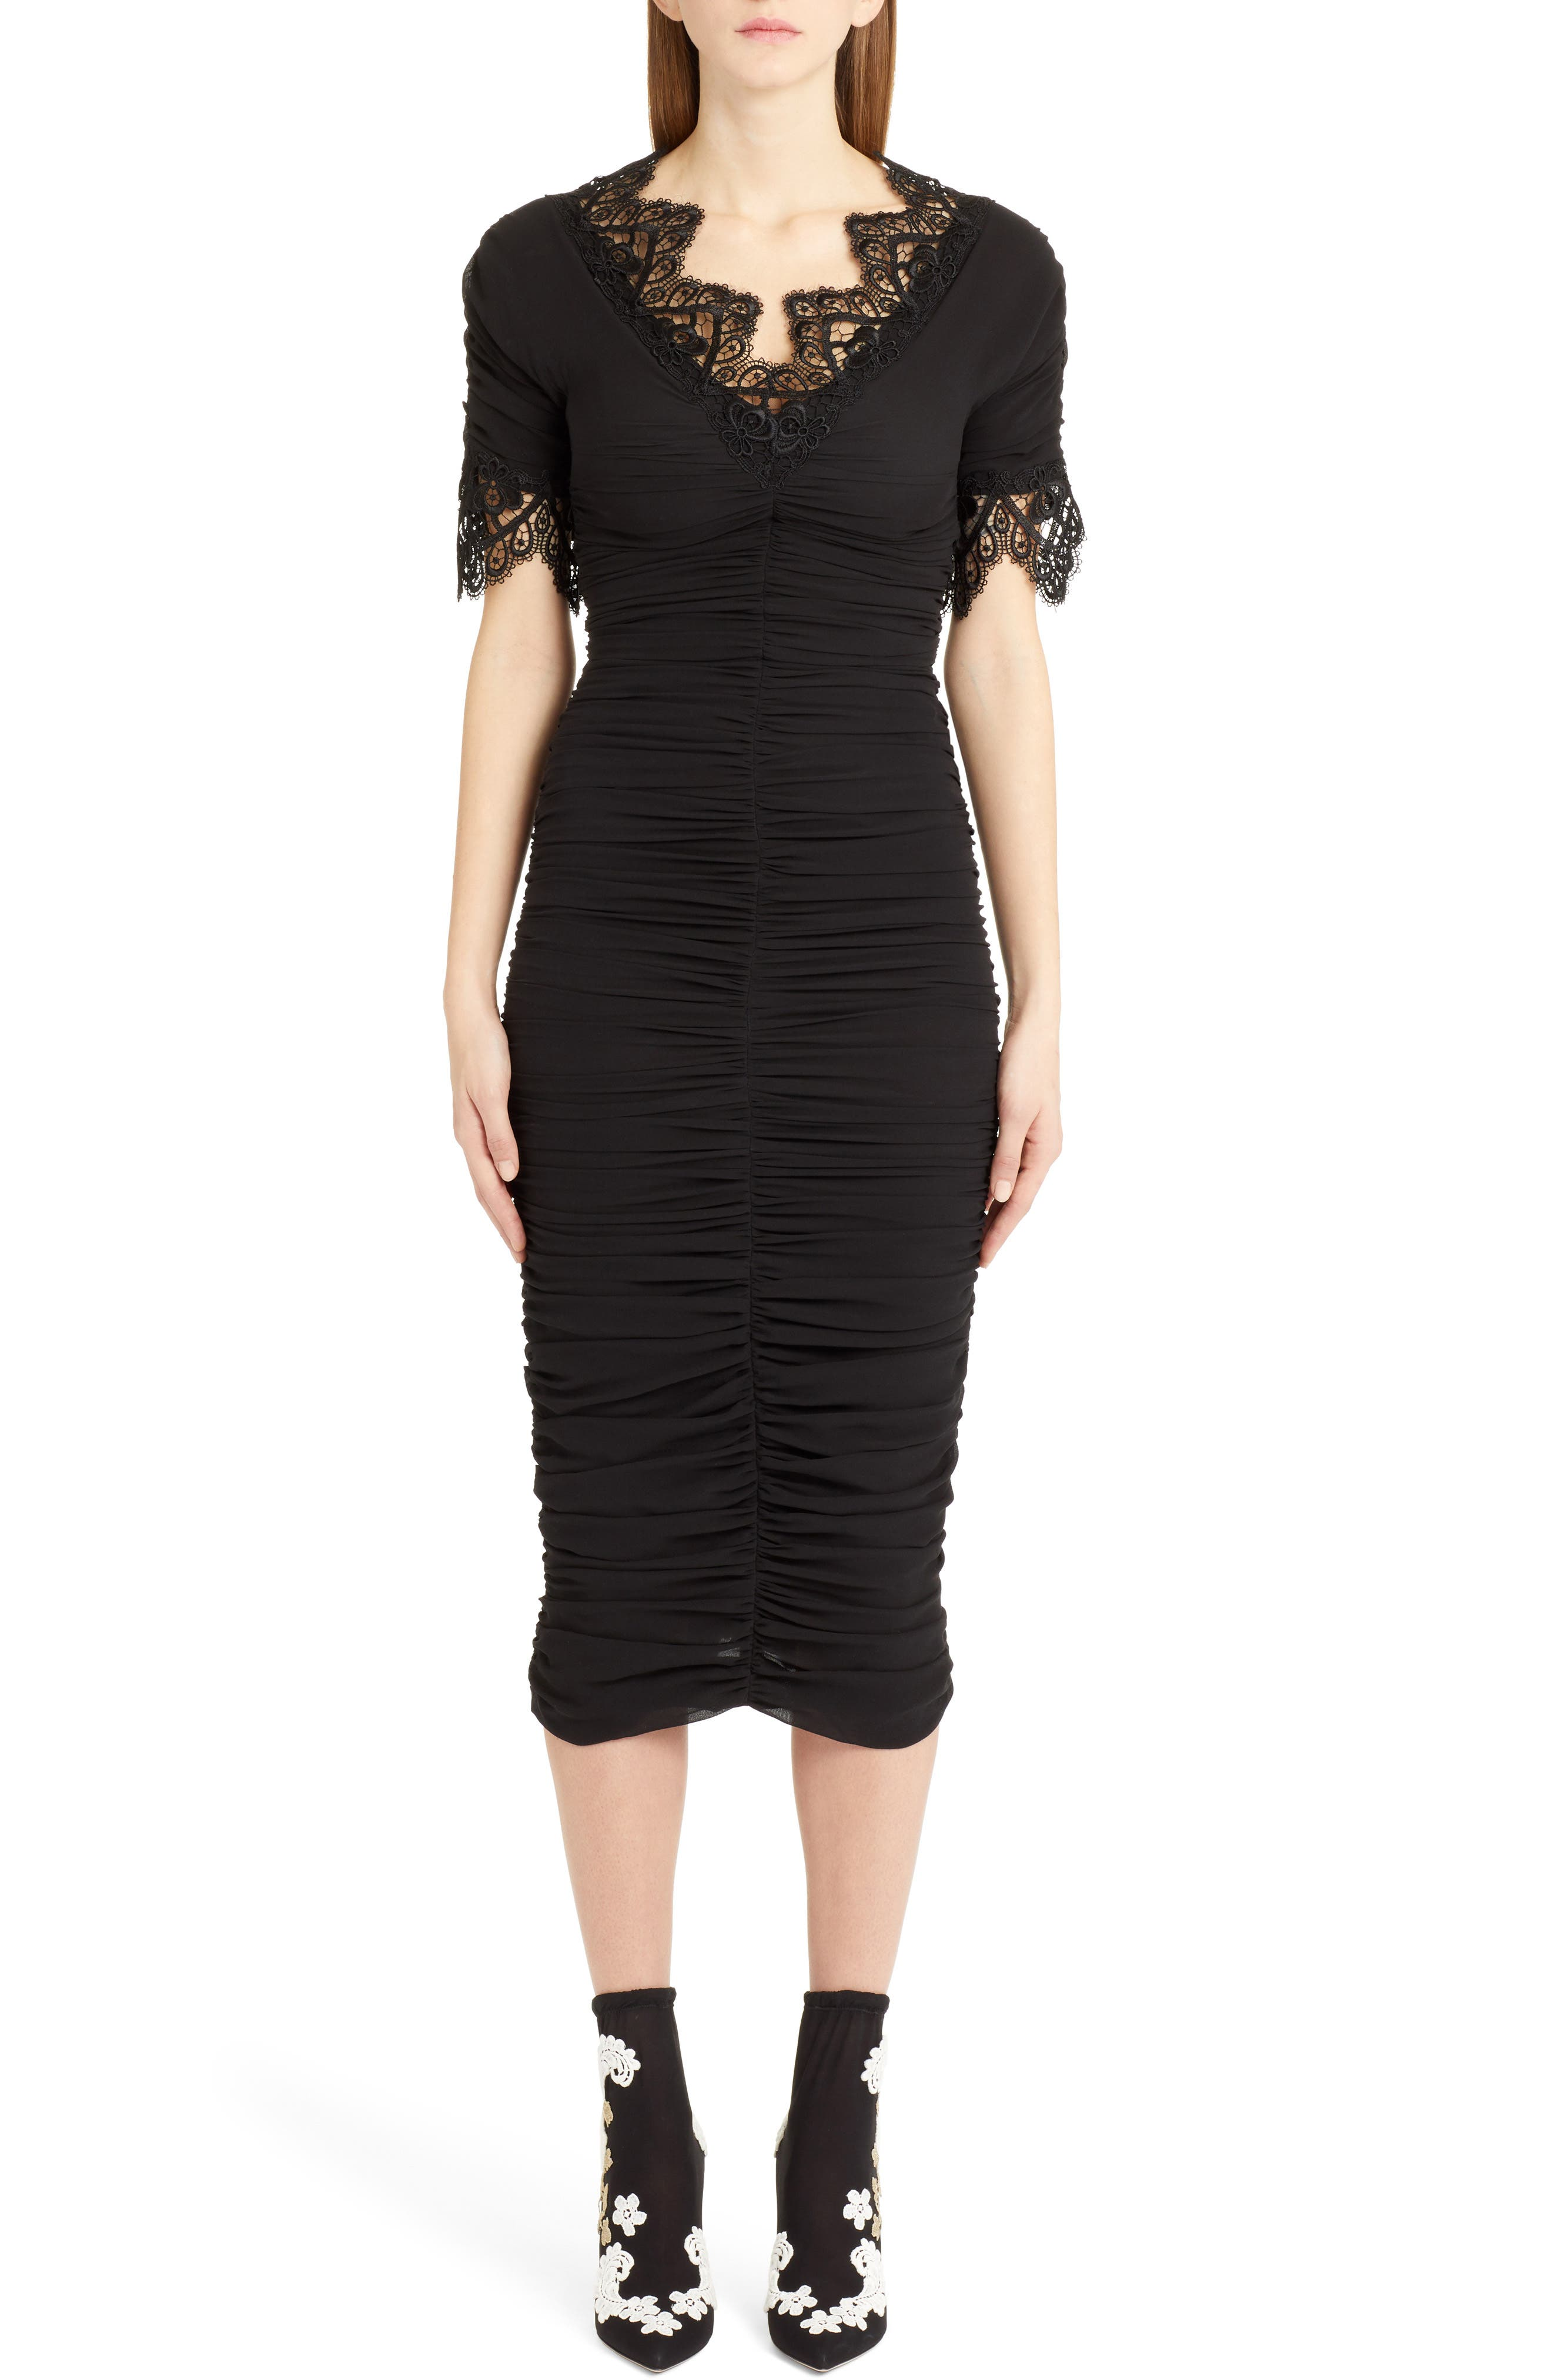 Dolce & gabbana Lace Trim Ruched Silk Blend Dress, 50 IT - Black